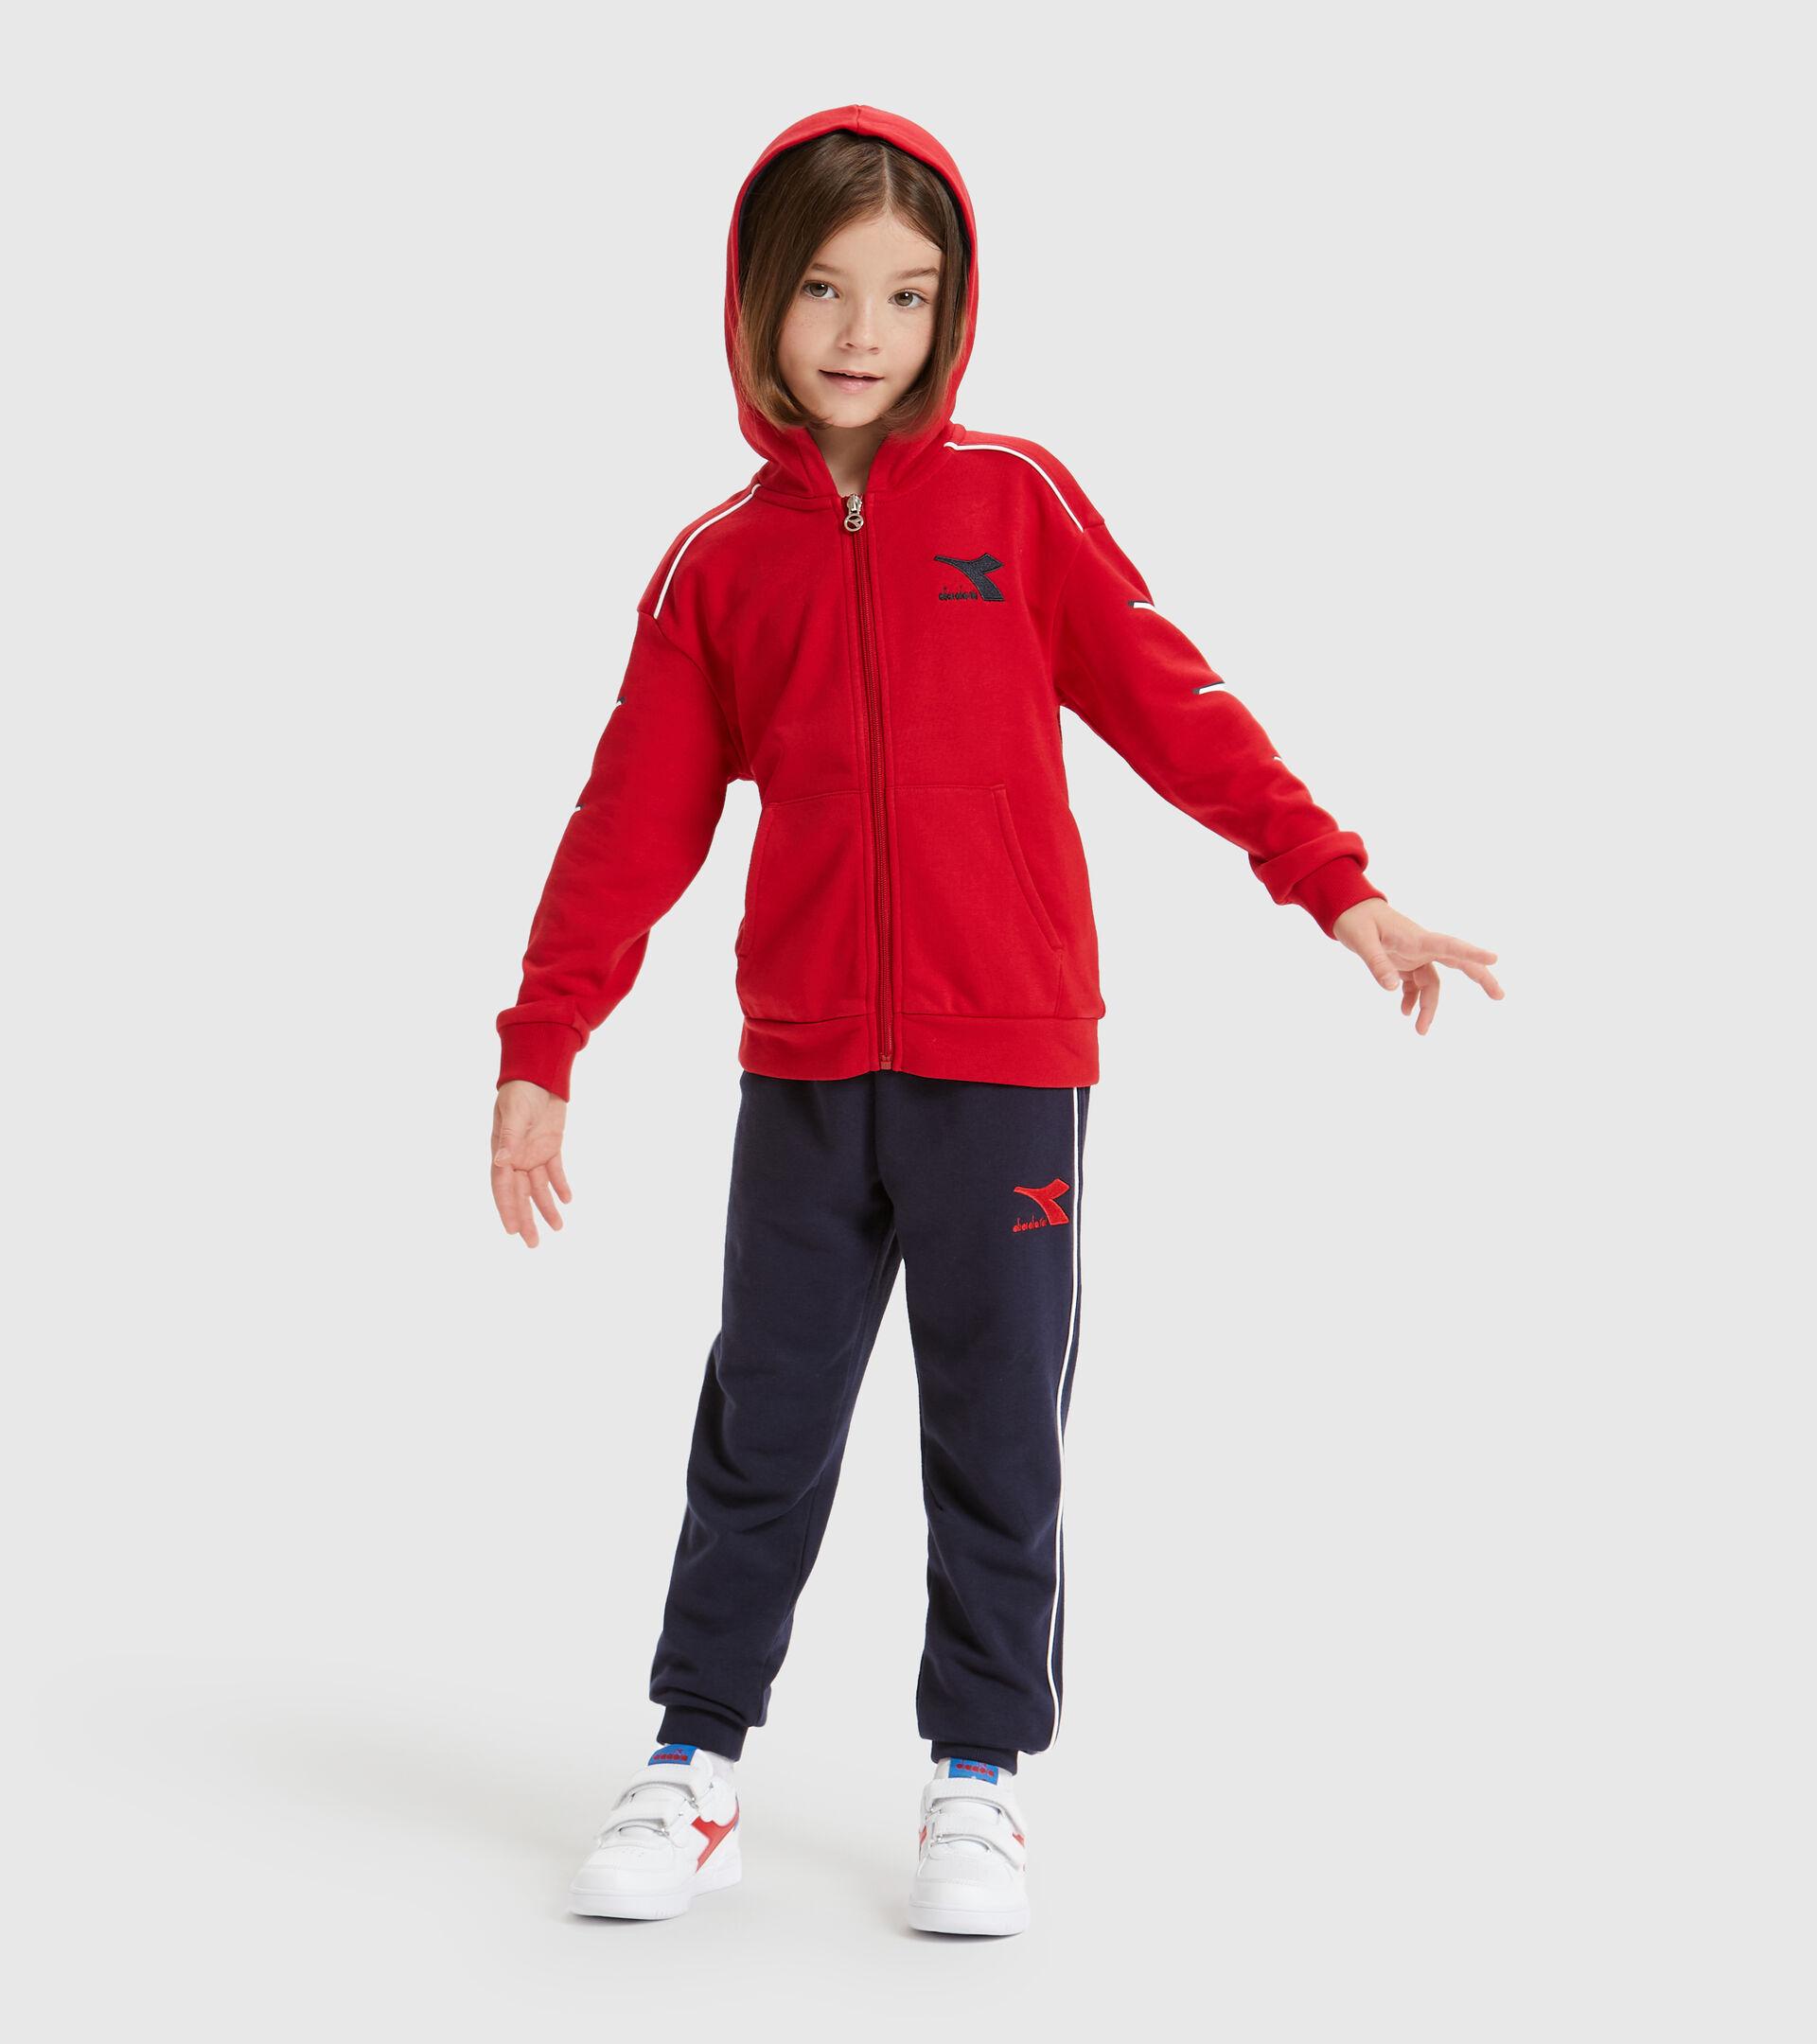 Trainingsanzug - Kinder JU.HD FZ TRACKSUIT CUBIC TANGOROT - Diadora